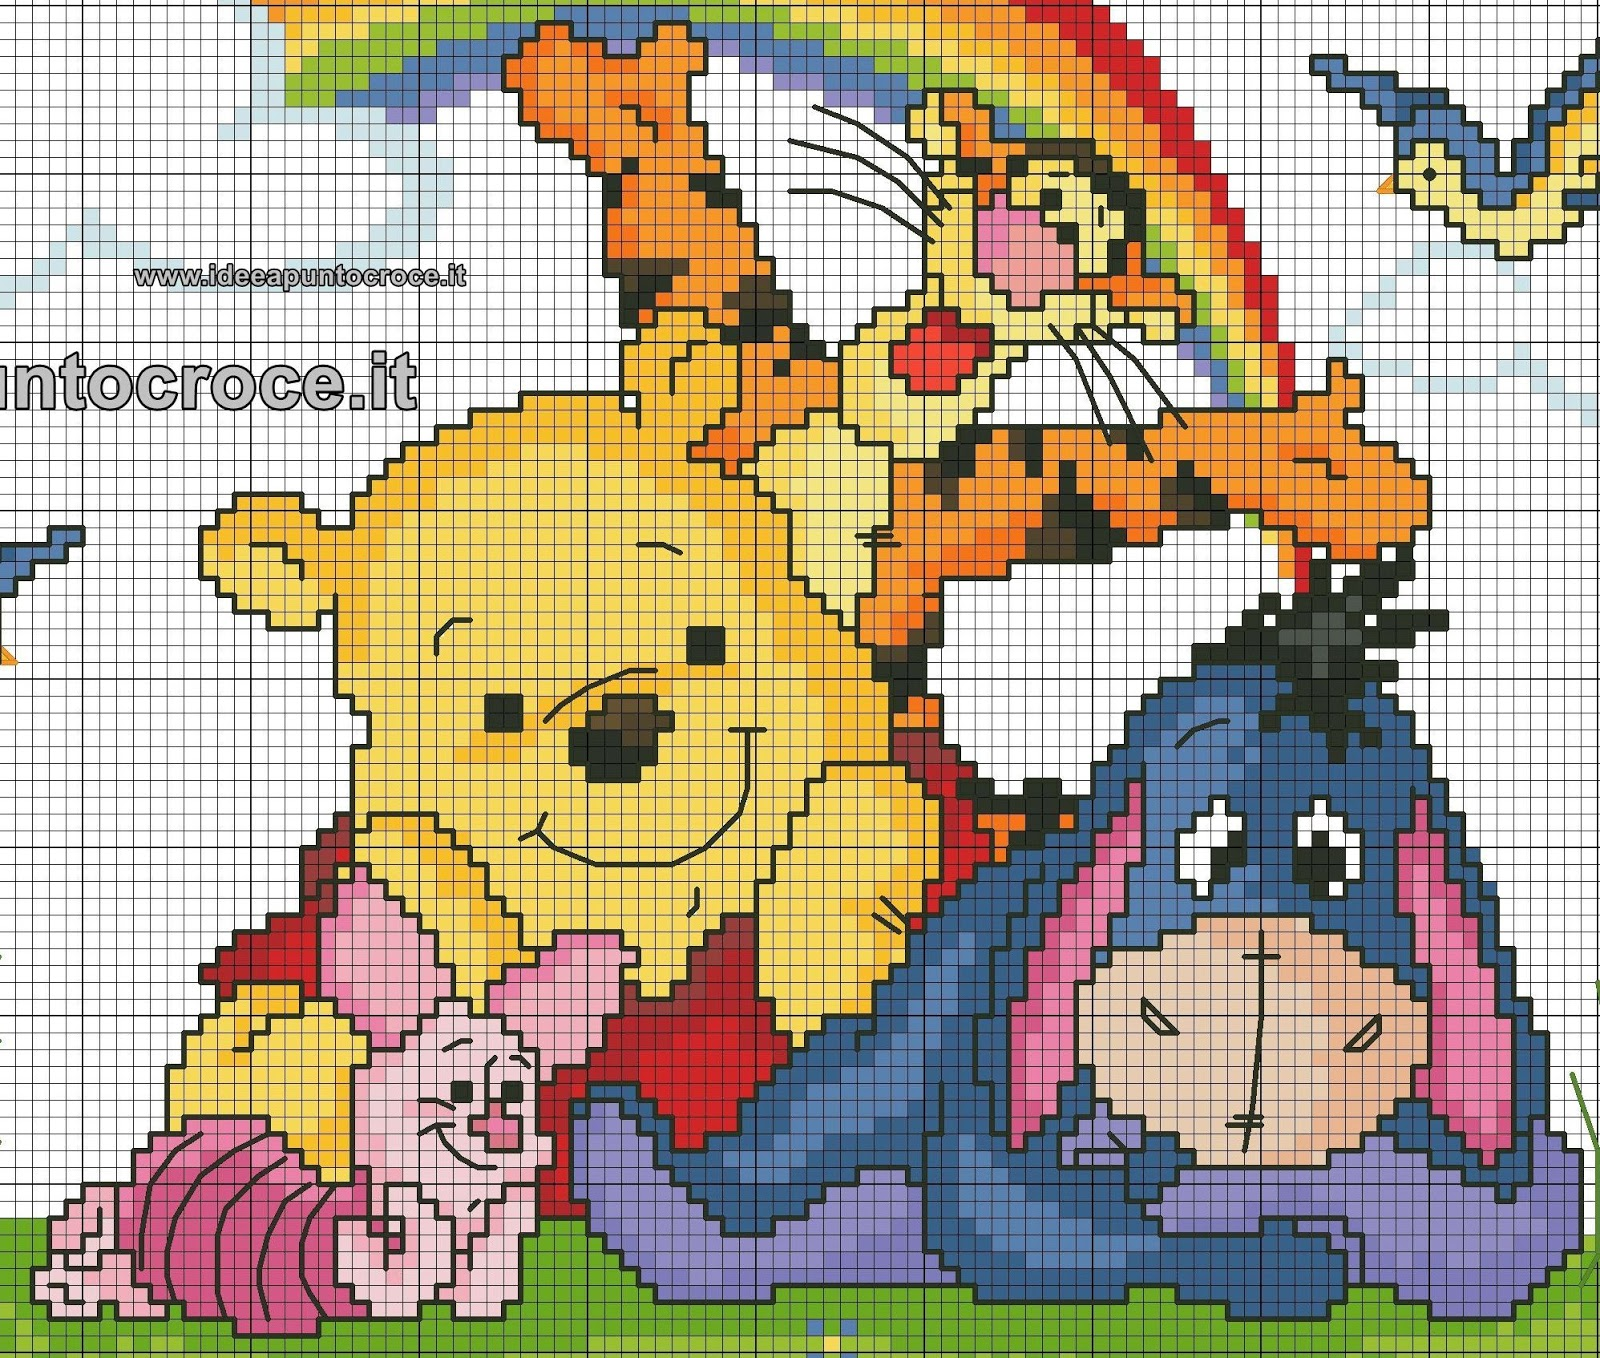 schemi disney a punto croce schemi baby winnie the pooh